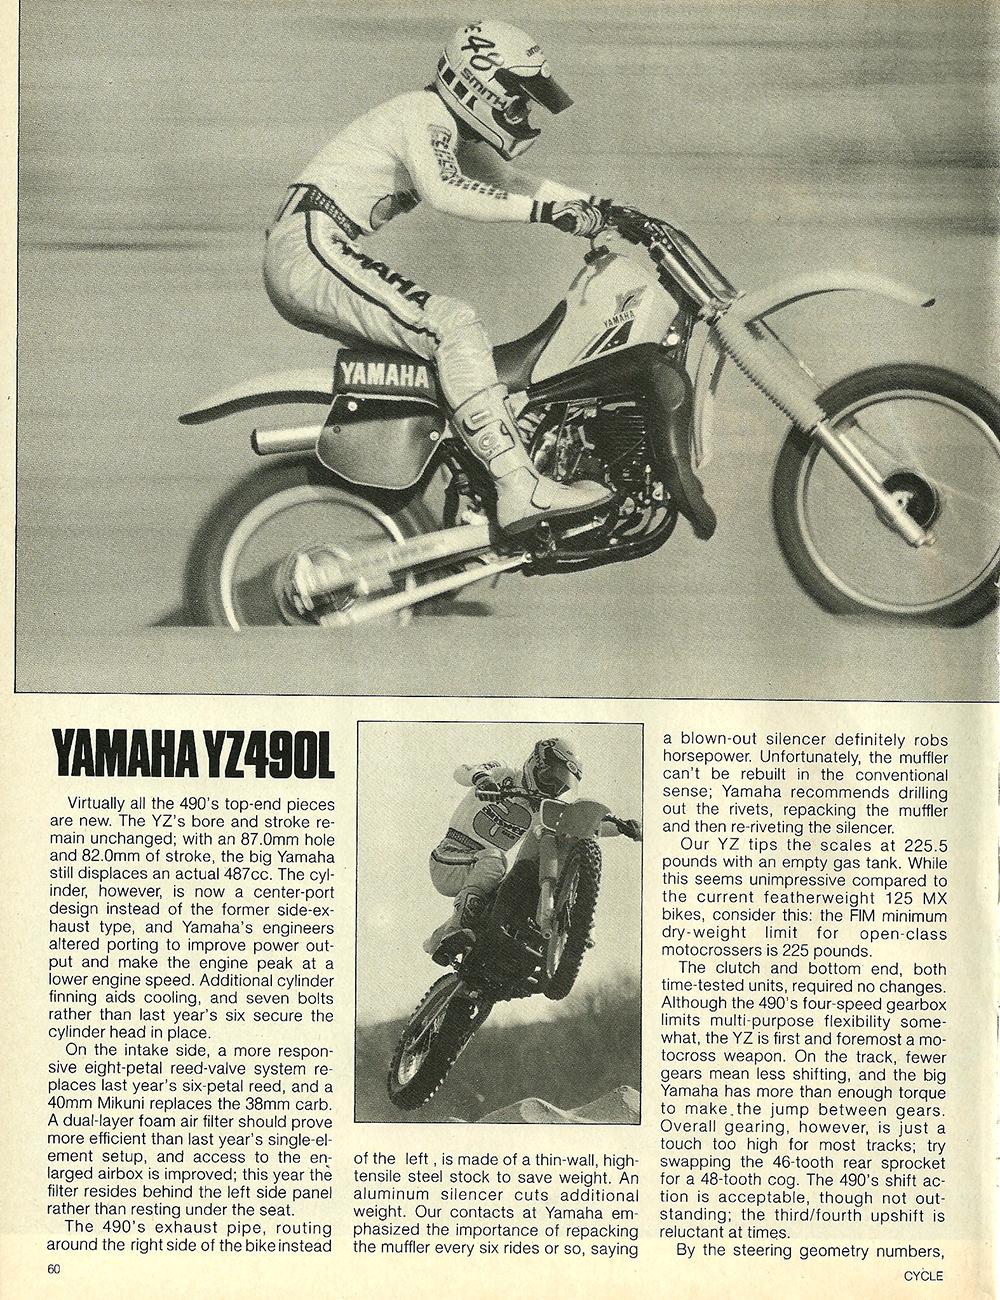 1984 Yamaha YZ490L off road test 3.jpg